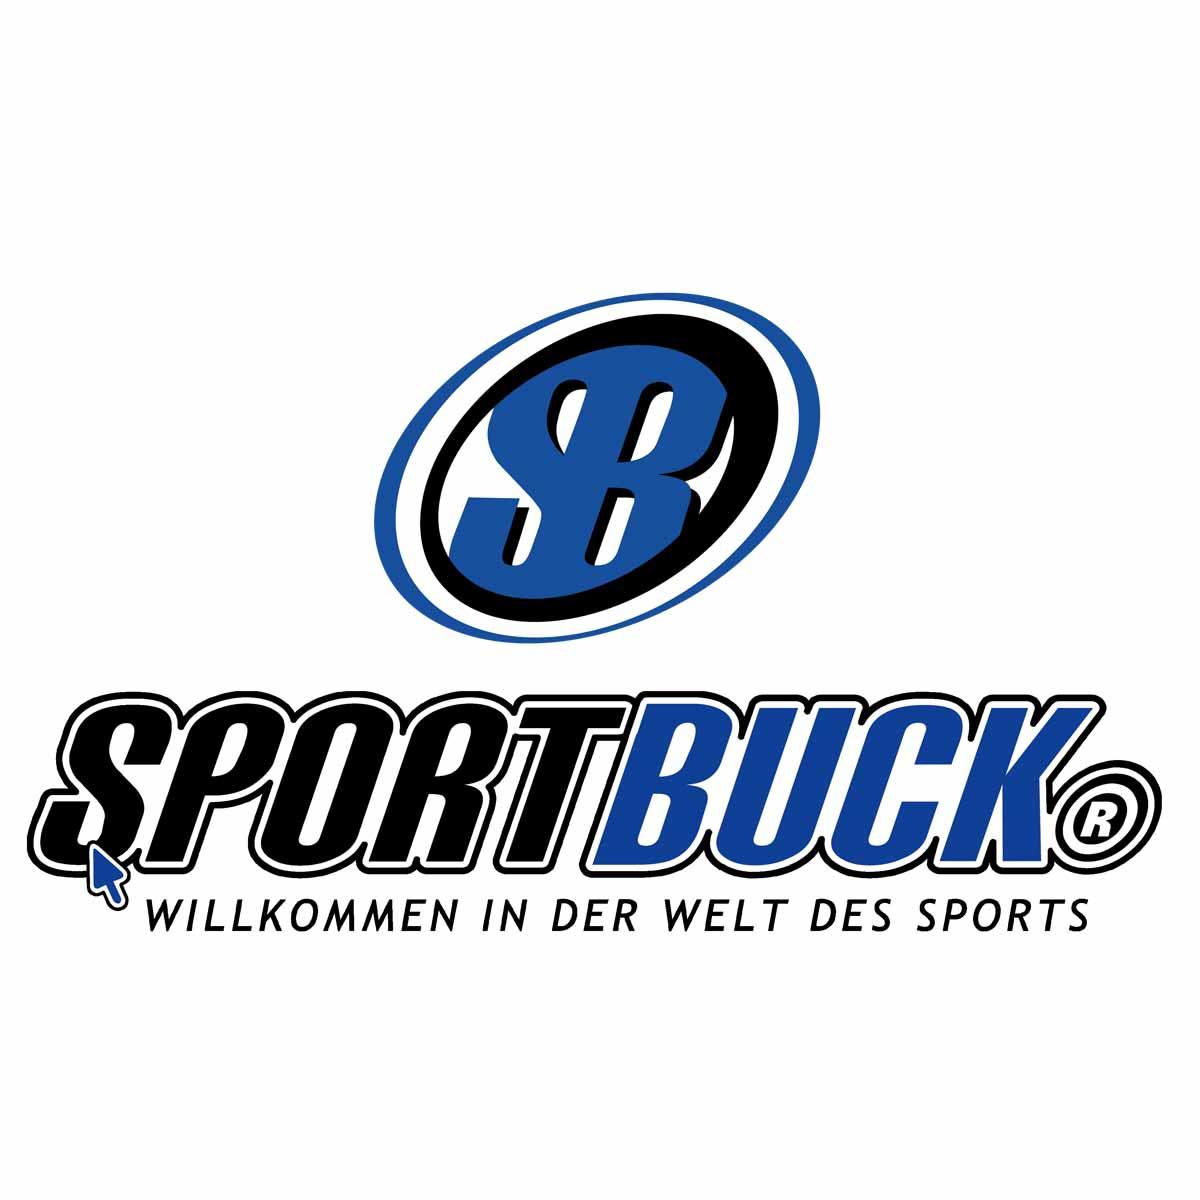 Grip Yellow Steigwax Gelb +4°C/-1°C 45 g